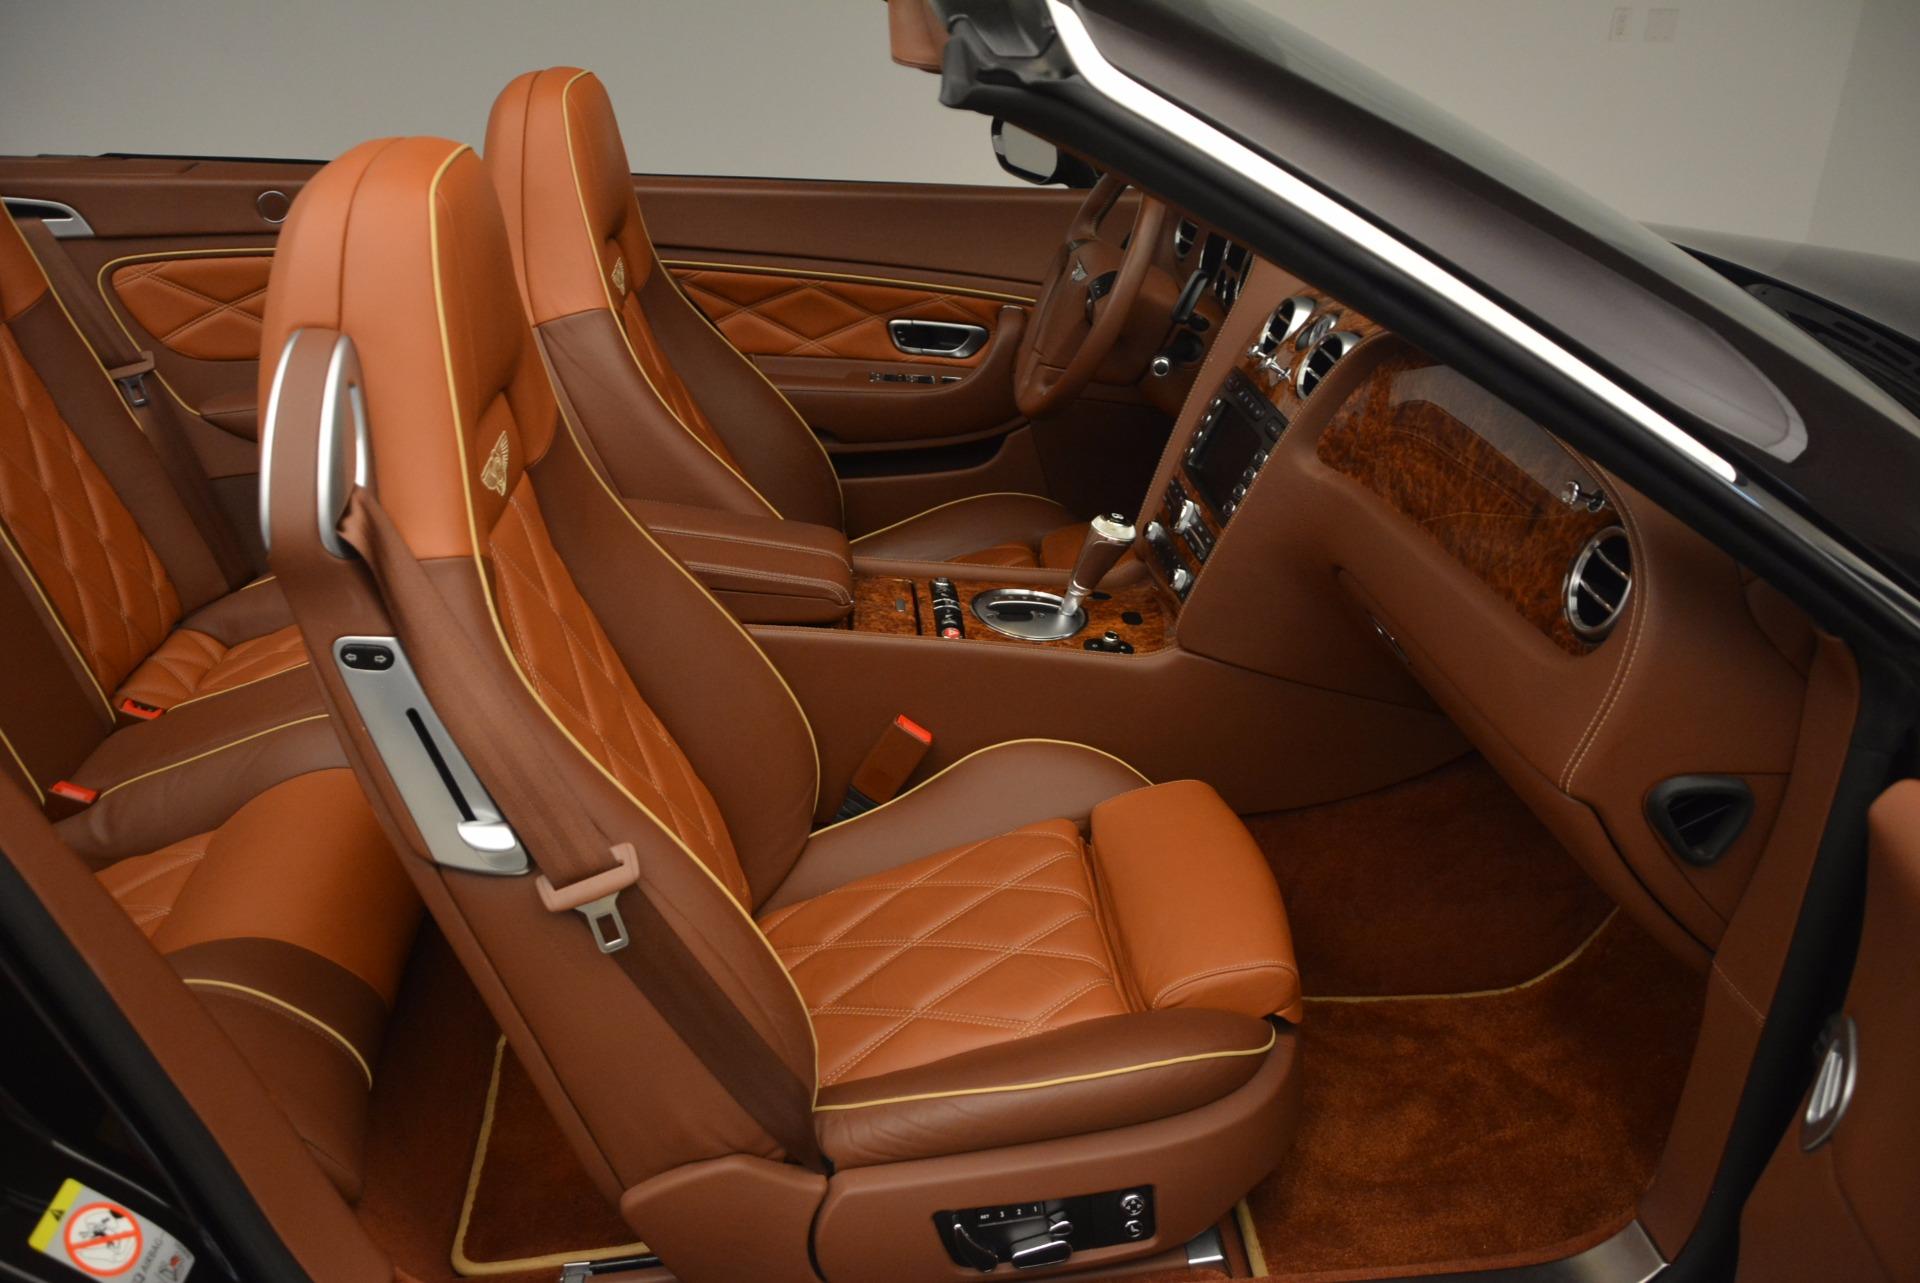 Used 2010 Bentley Continental GT Series 51 For Sale In Westport, CT 1222_p42